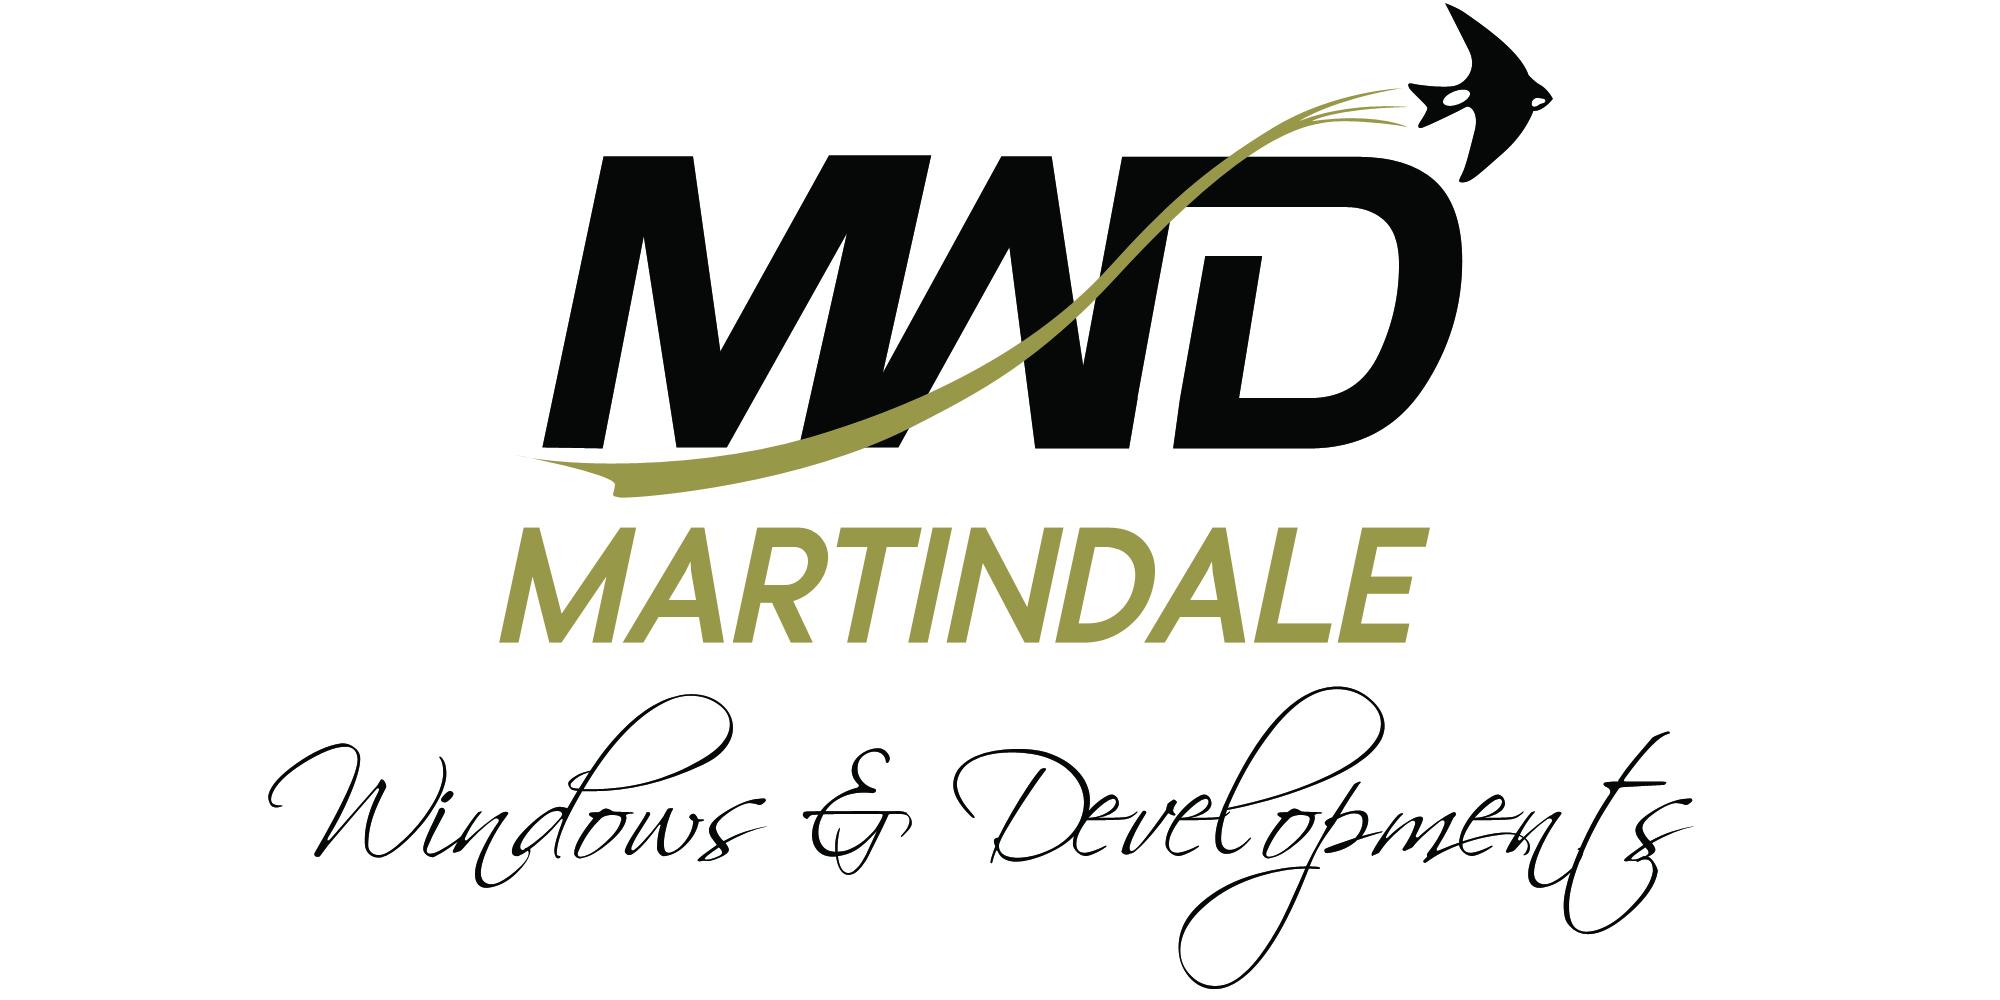 Martindale Windows and Developments Ltd Verified Logo